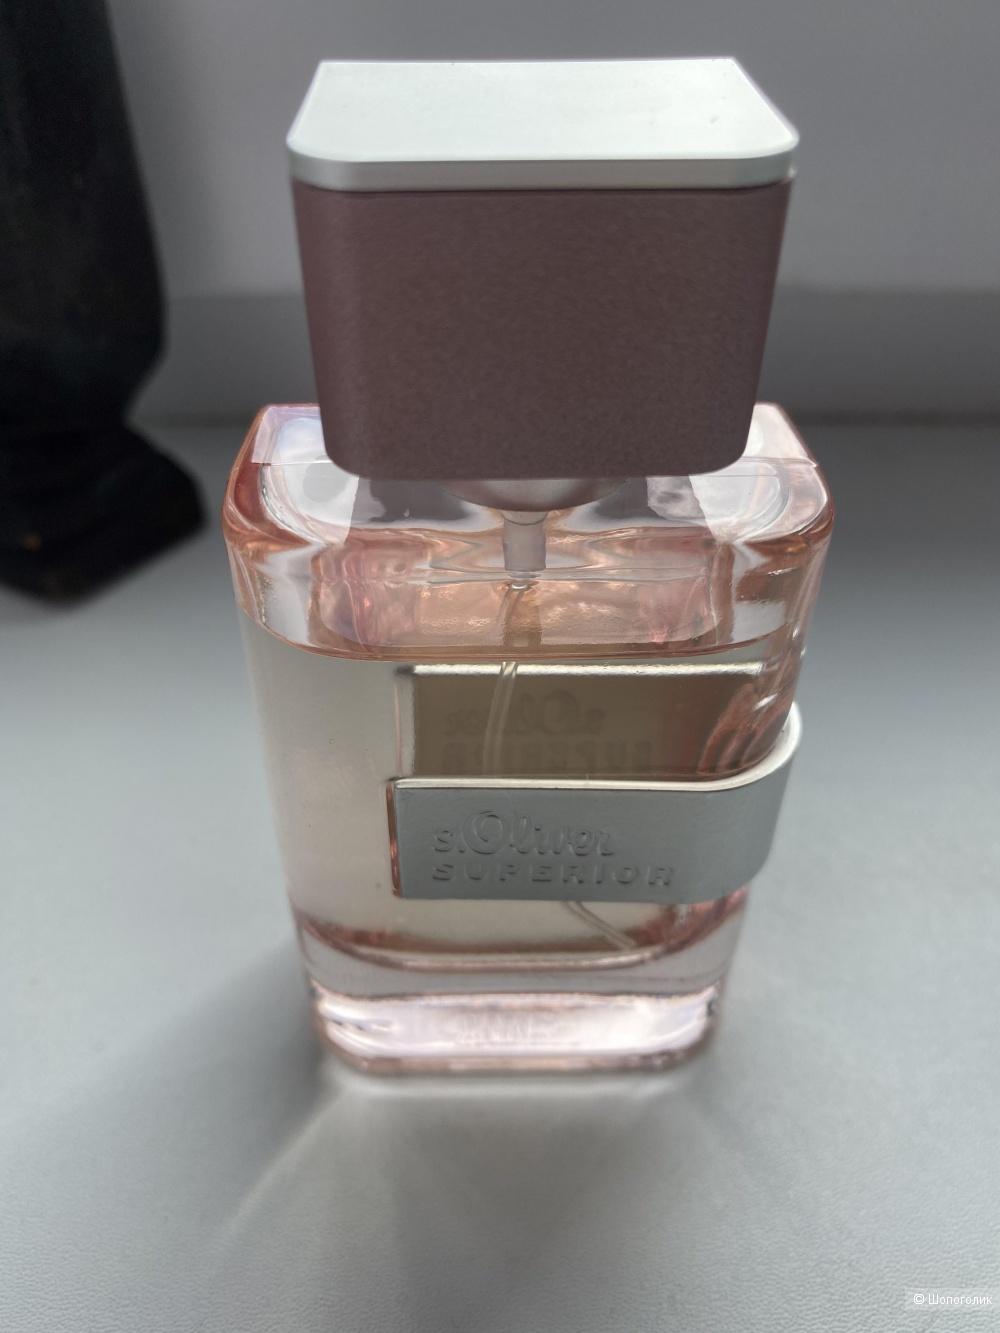 EDT S'Oliver Superior 25/30 ml